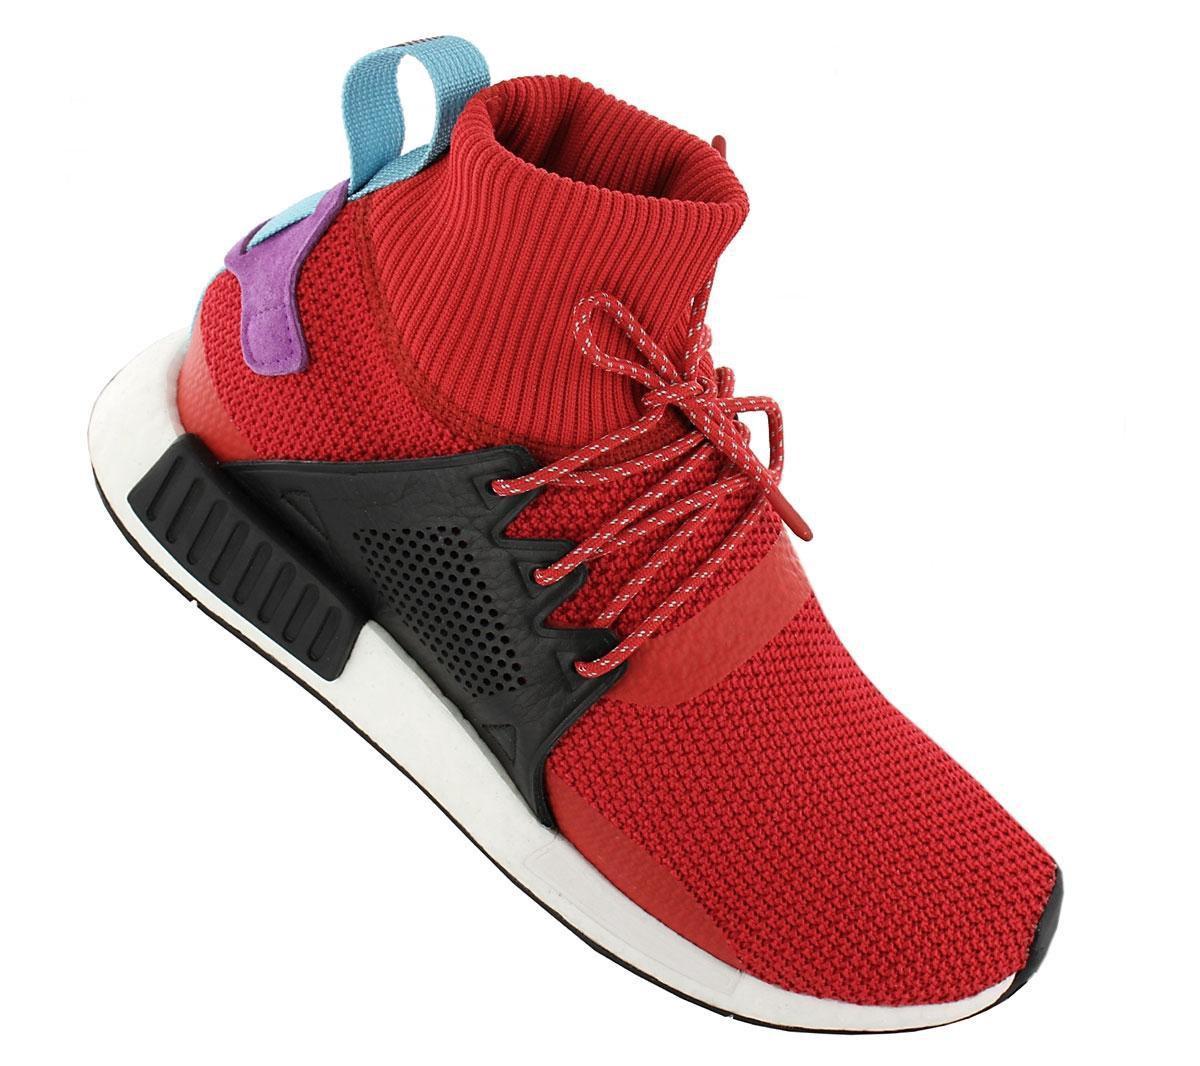 adidas NMD XR1 Winter schoenen rood